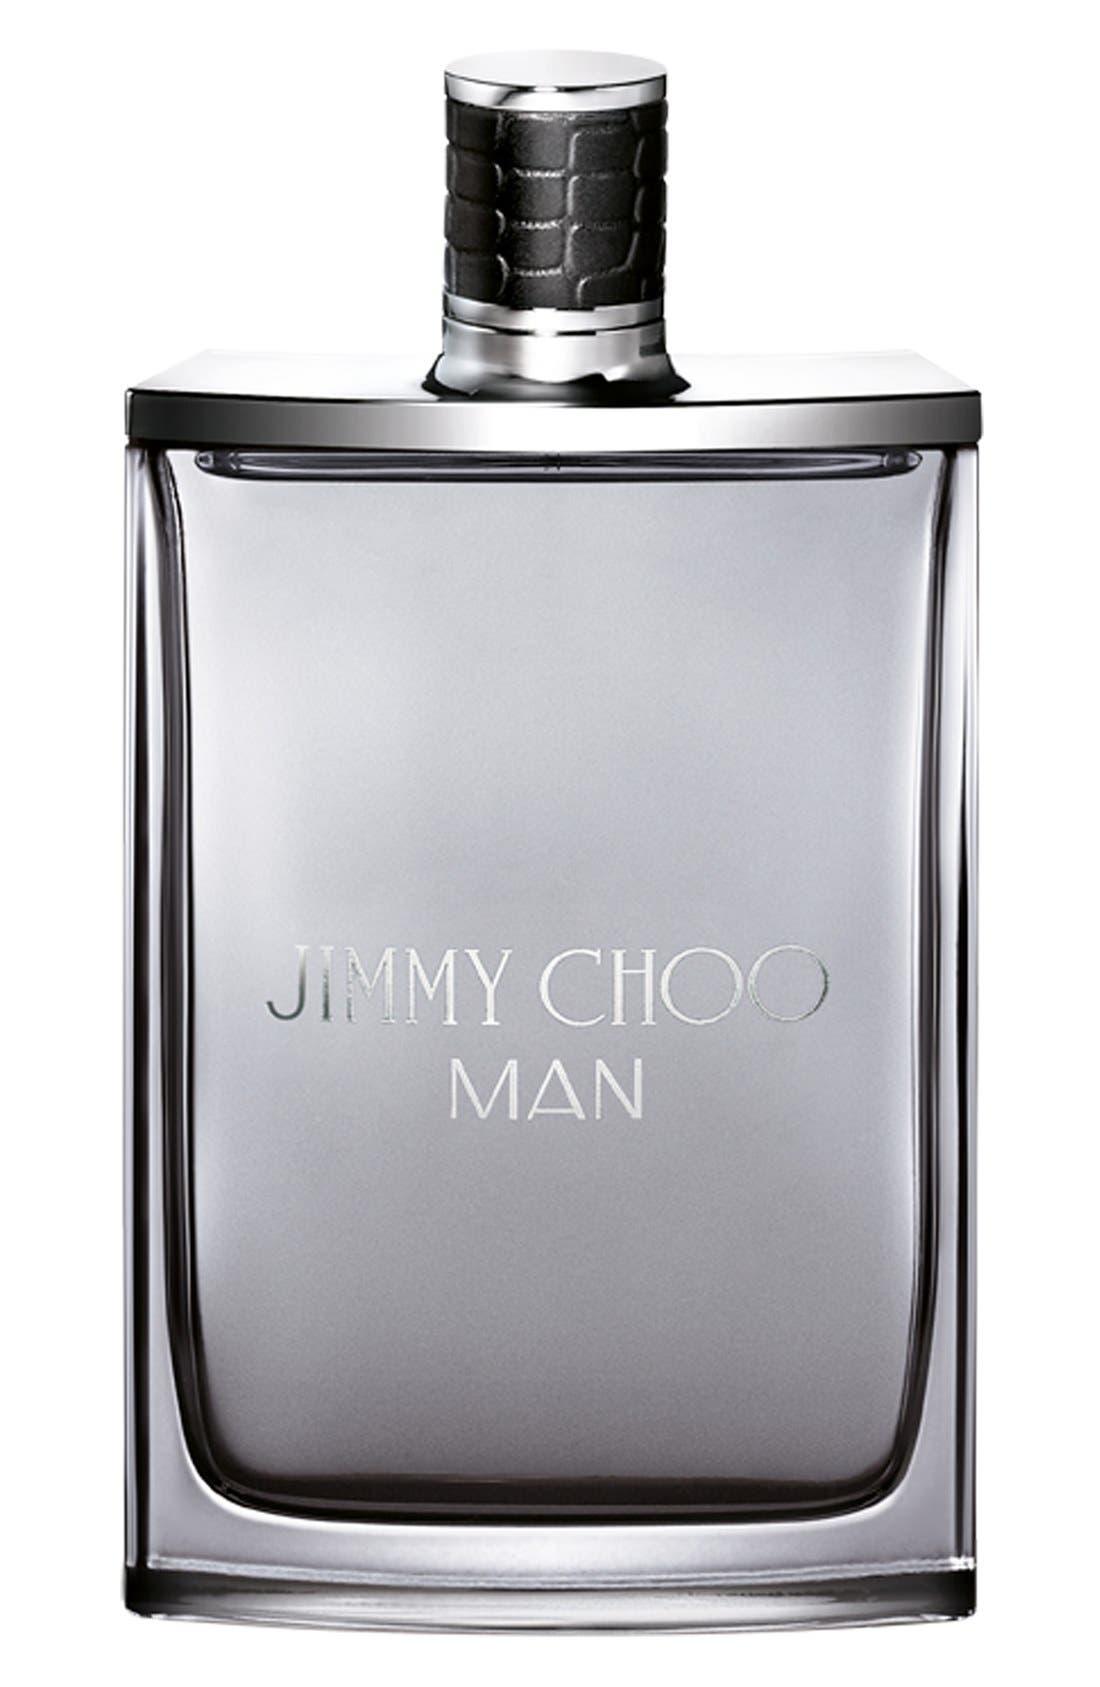 Jimmy Choo 'MAN' Jumbo Eau de Toilette Spray (Limited Edition) (6.7 oz.)